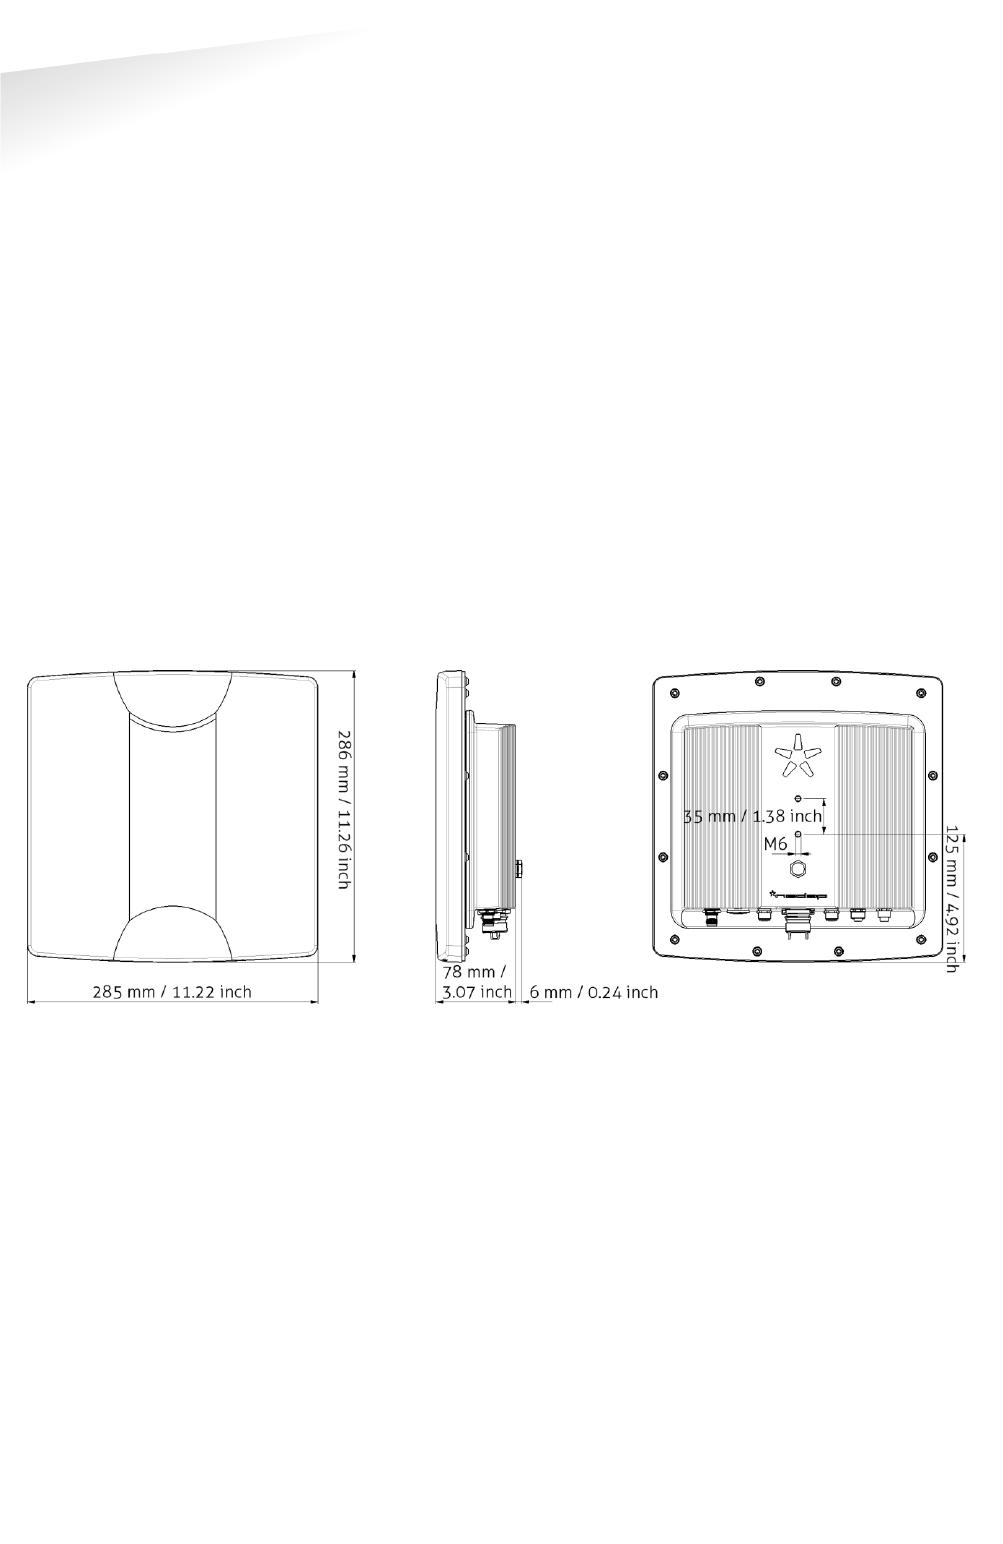 N V Nederlandsche Apparatenfabriek NEDAP UPASSTAR UHF RFID